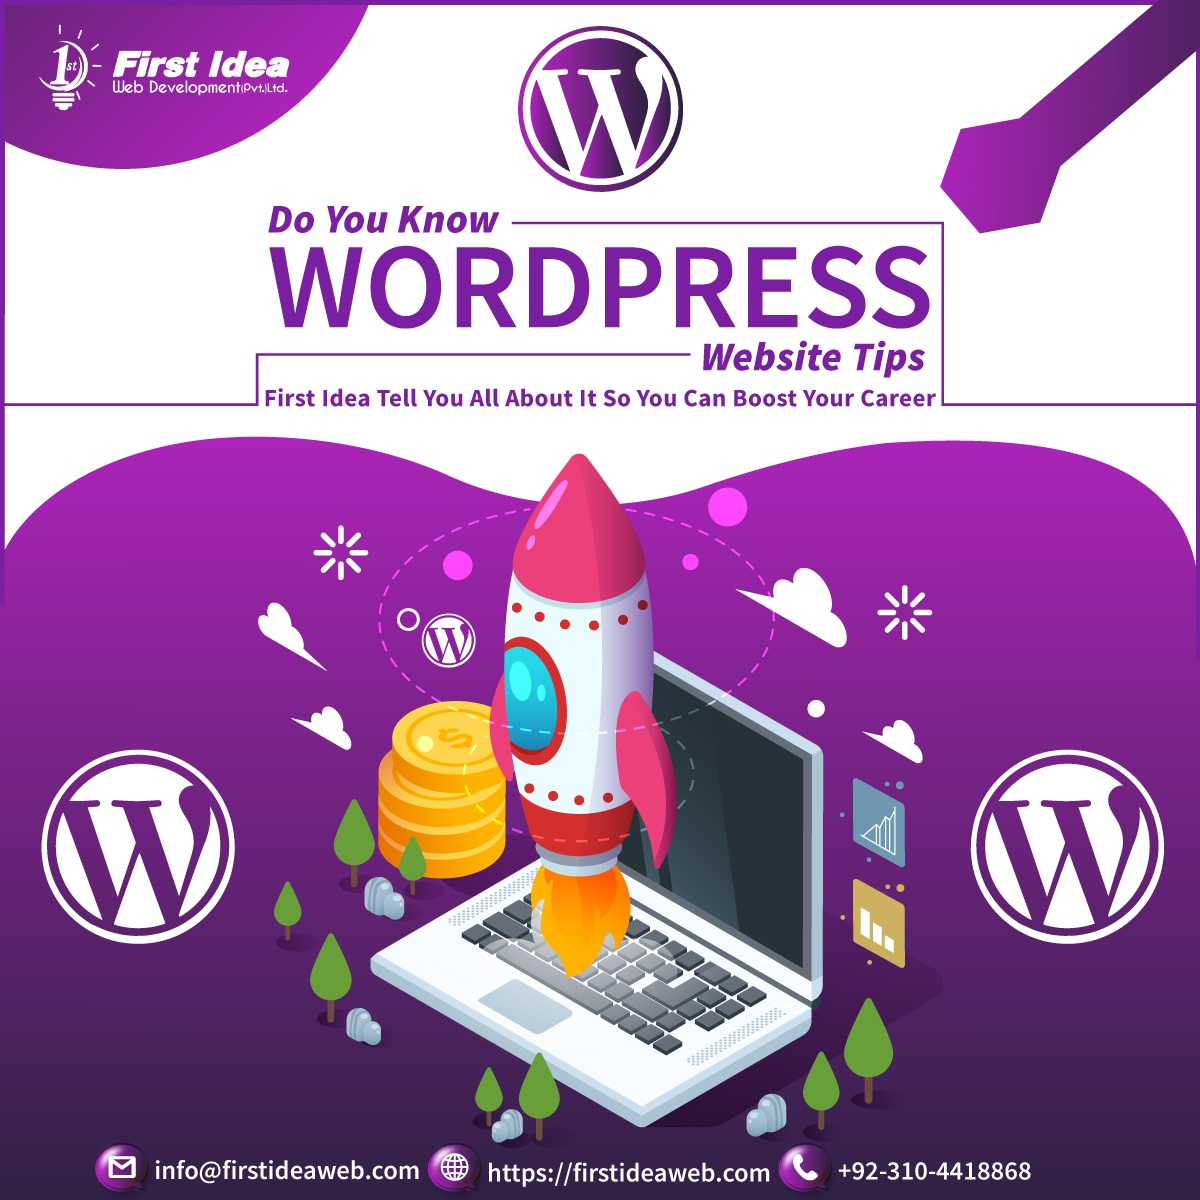 WordPress website tips, secure a WordPress site, WordPress website security, secure your WordPress website